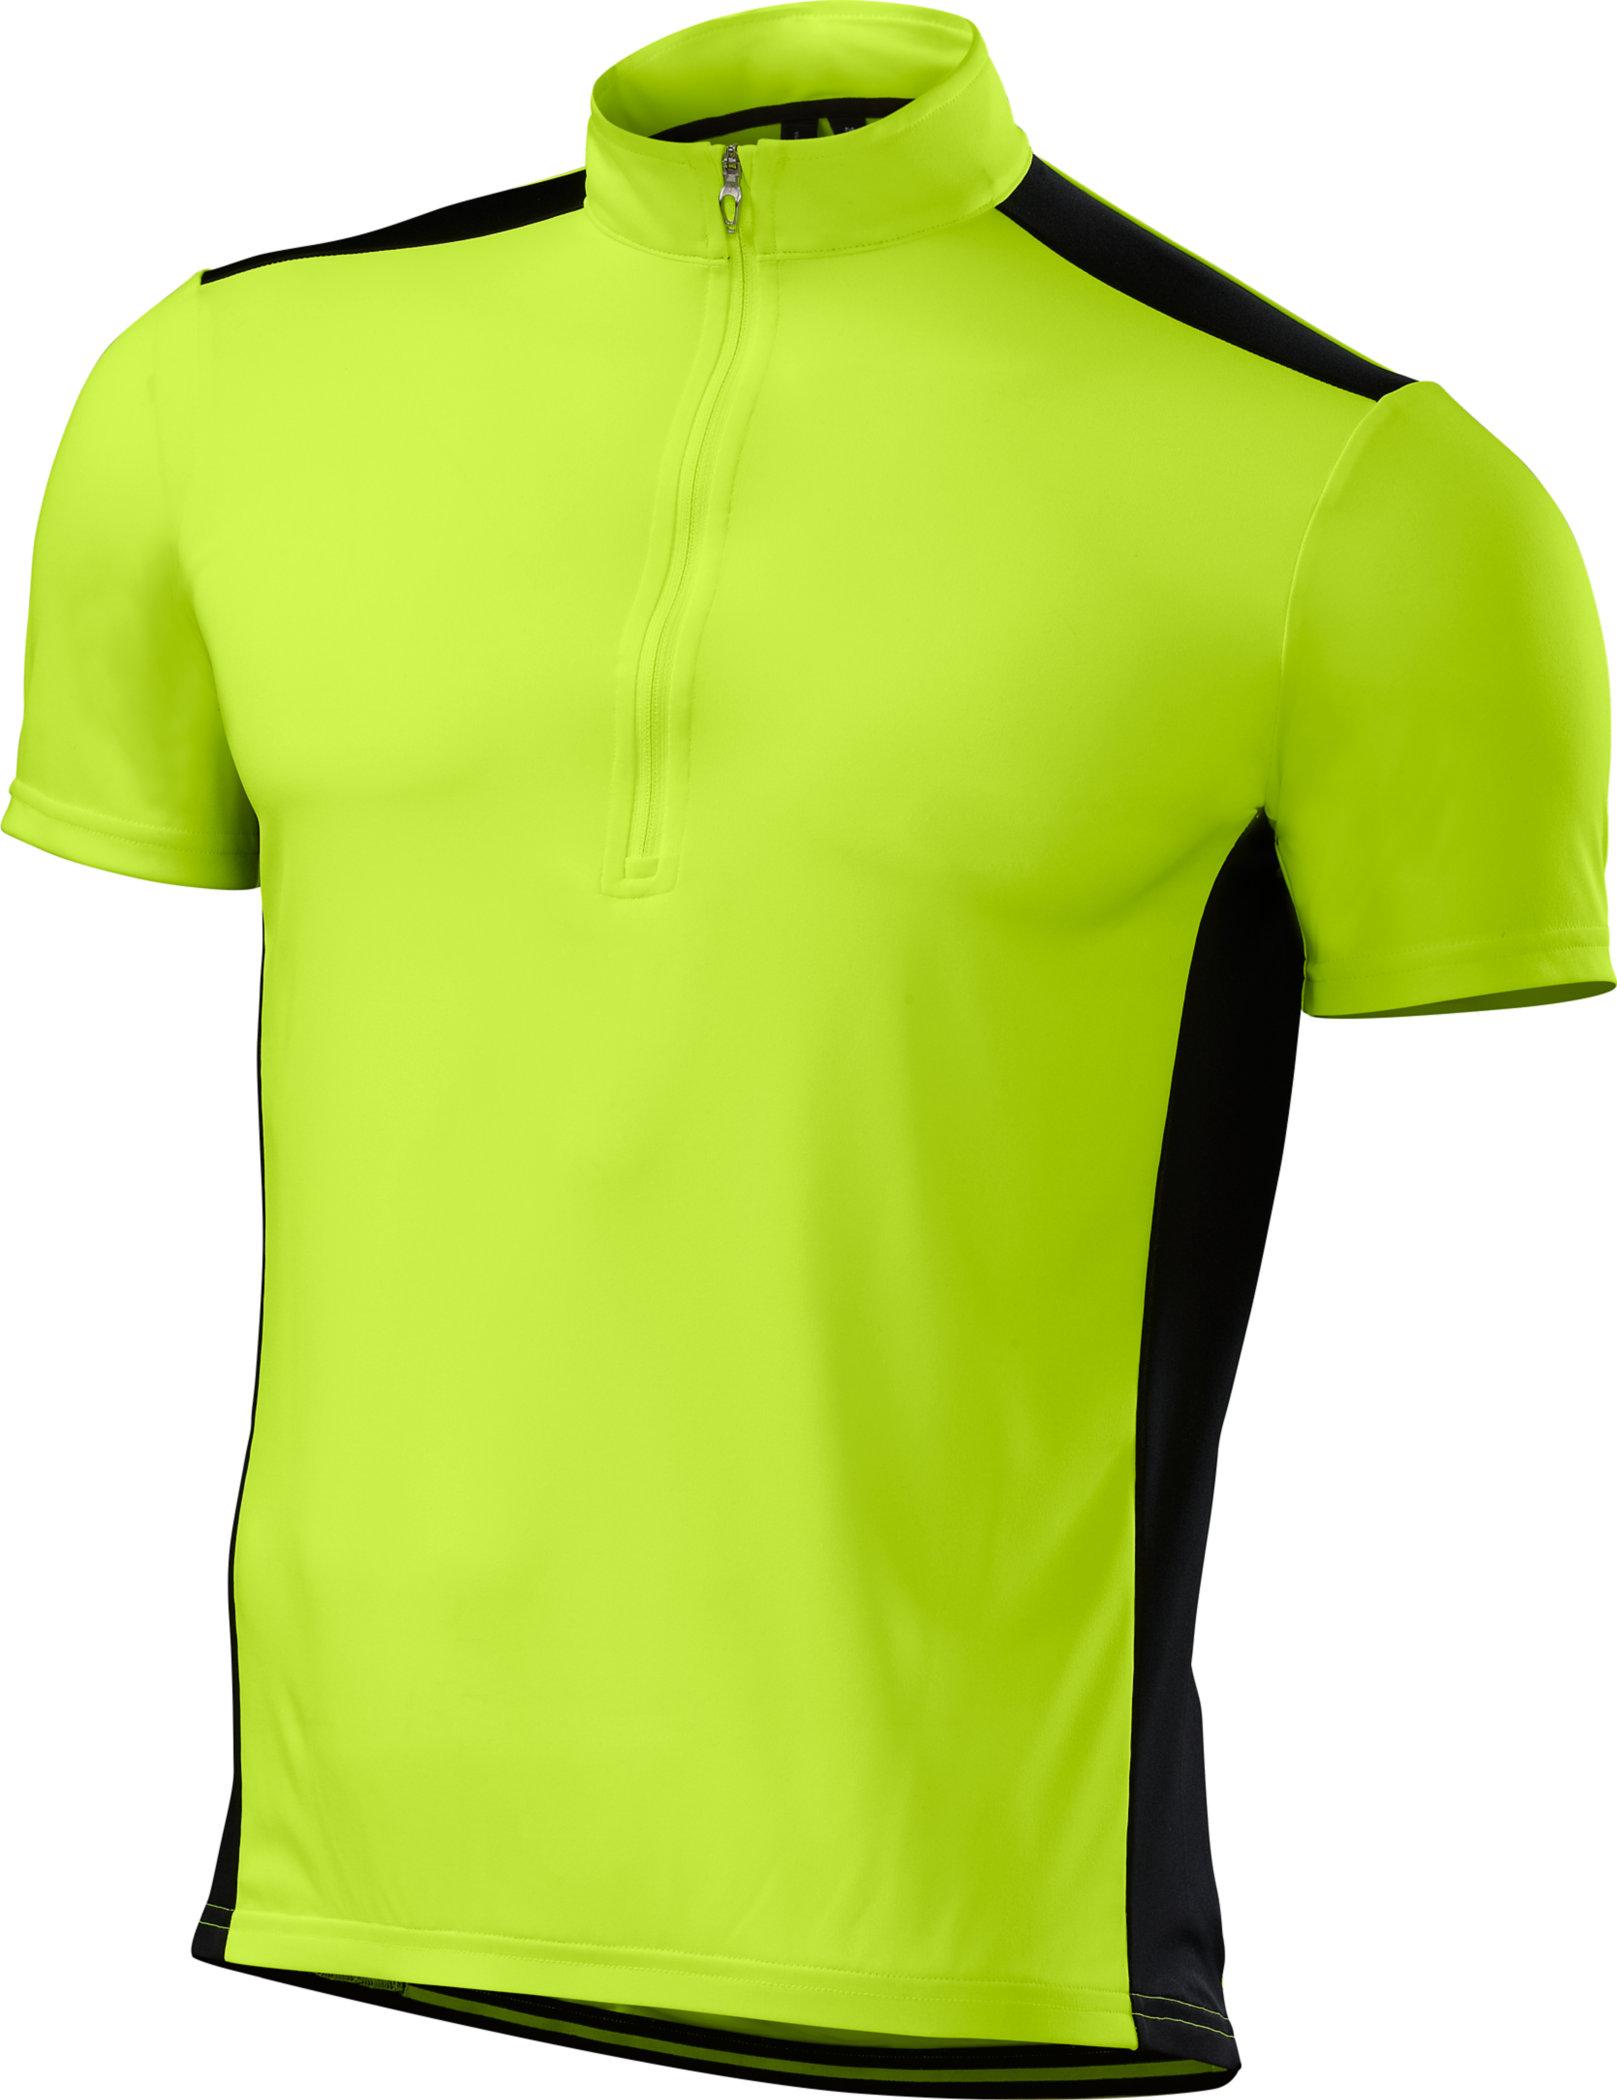 Specialized RBX Jersey Neon Yellow Medium - Alpha Bikes